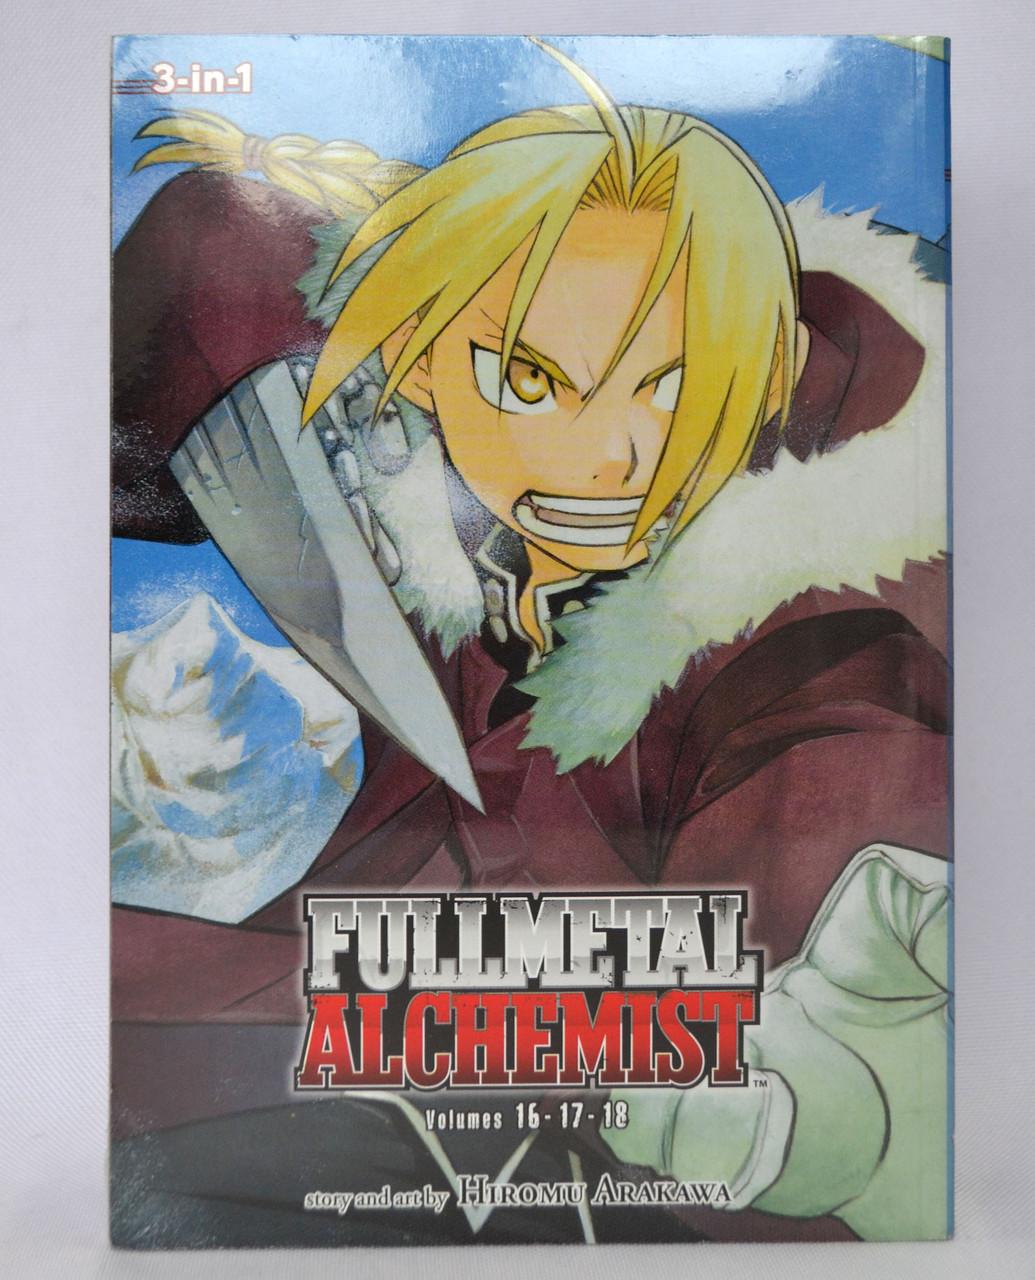 Manga Fullmetal Alchemist (3-in-1 Edition), Vol. 6 (English language)